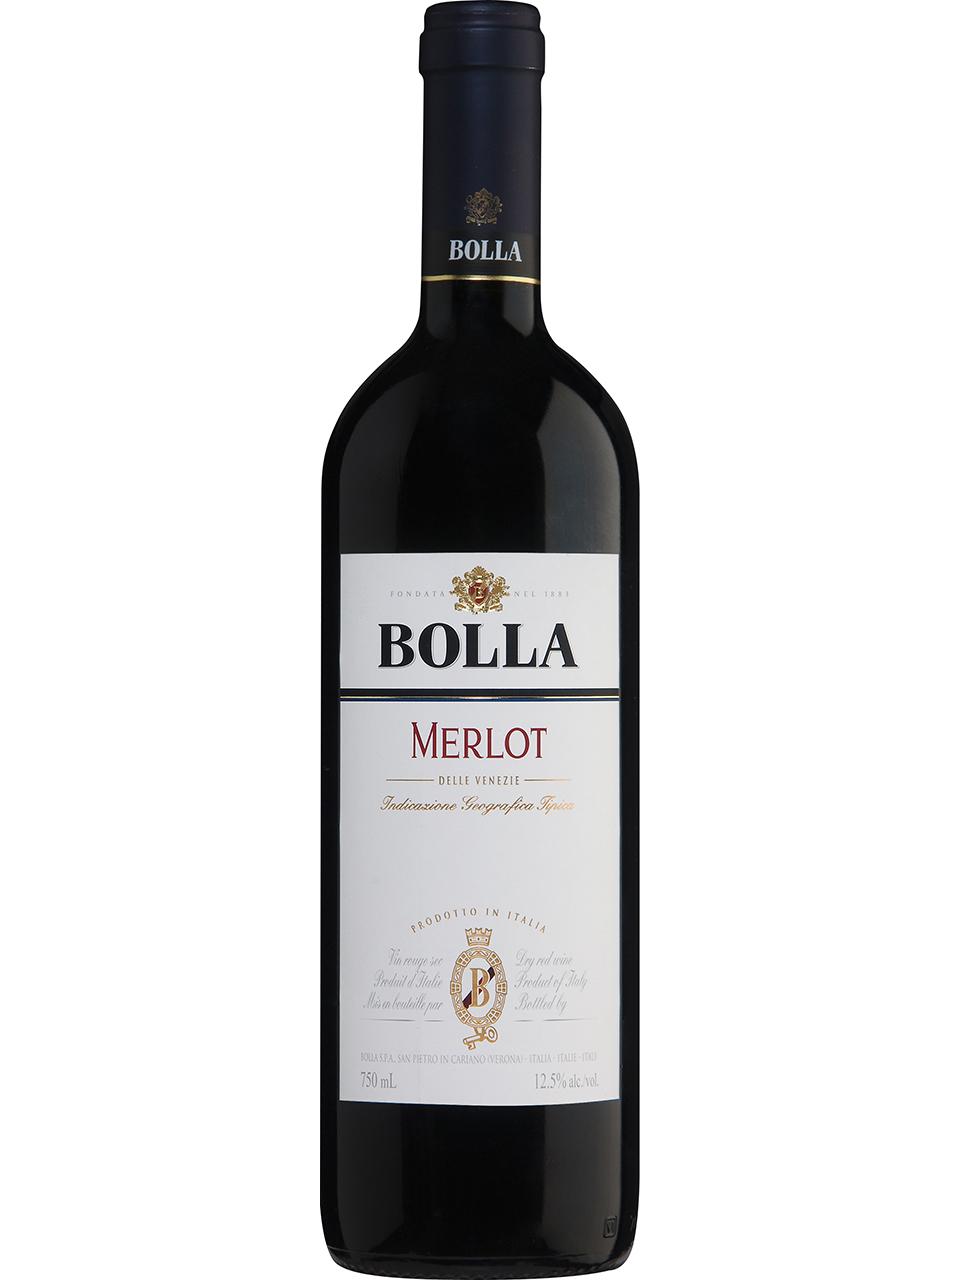 Bolla Merlot Delle Venezie IGT